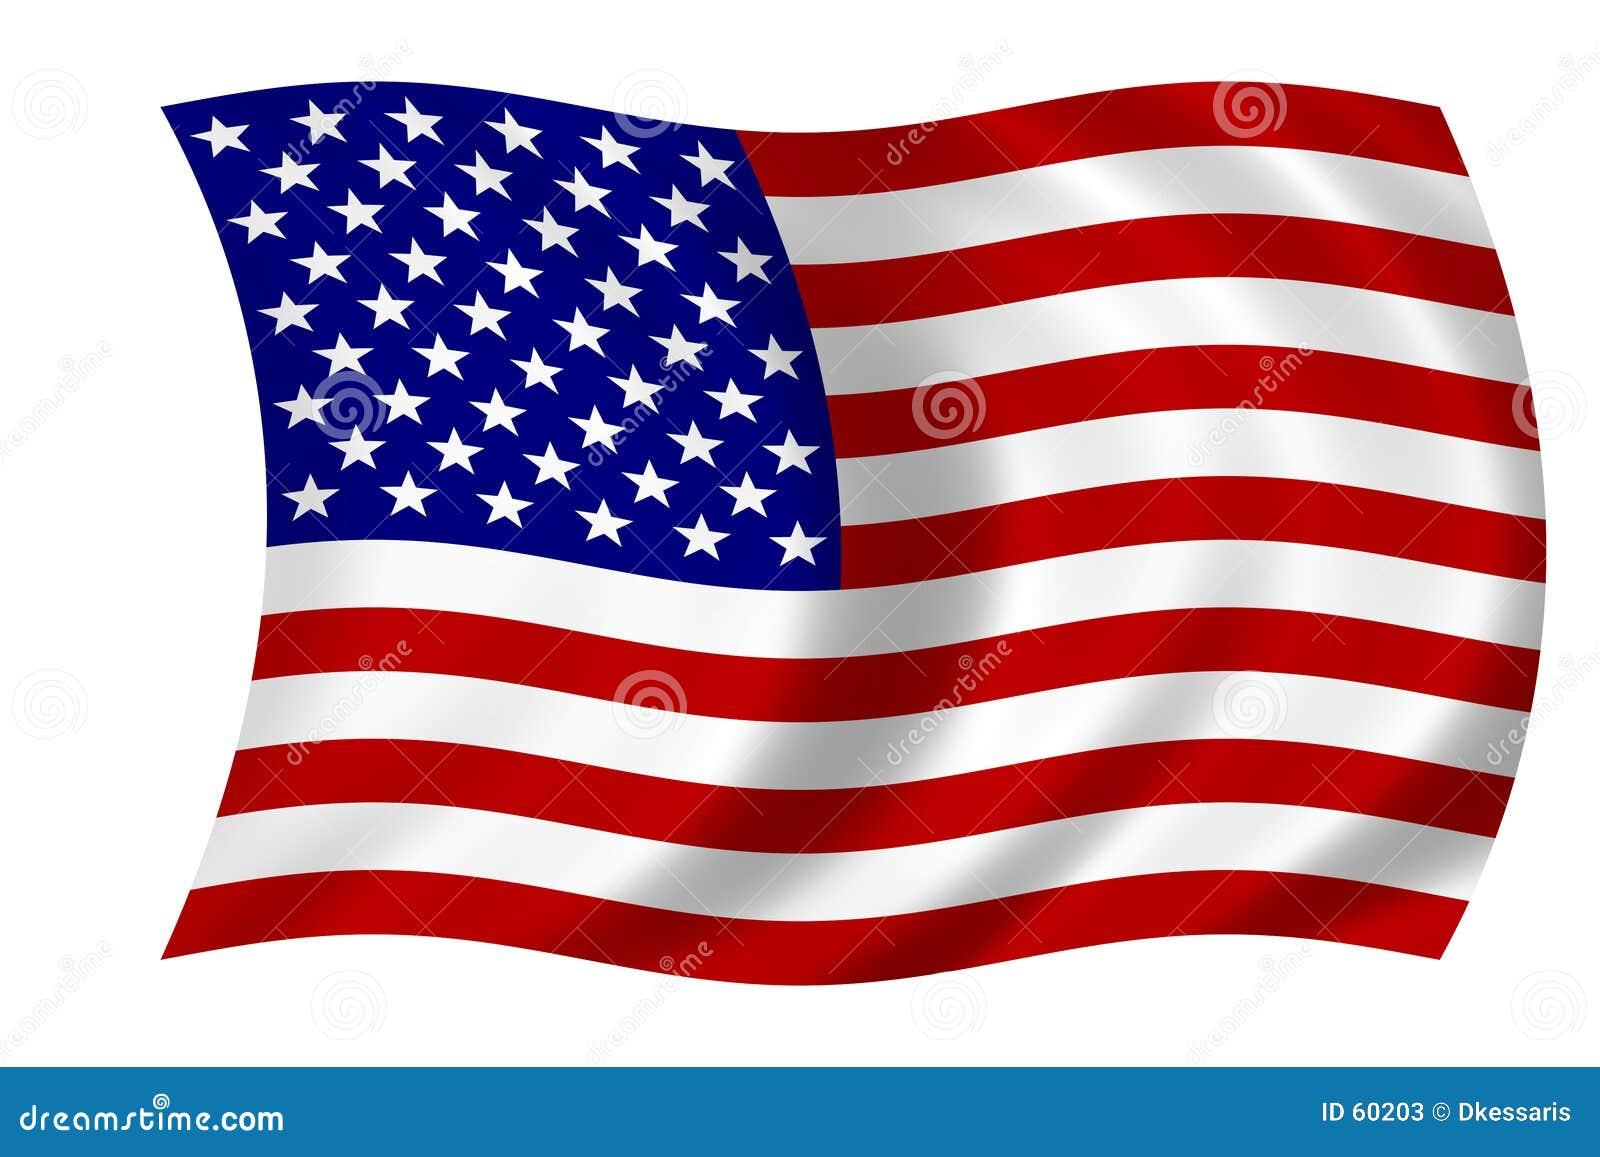 Download Indicateur américain illustration stock. Illustration du symbole - 60203